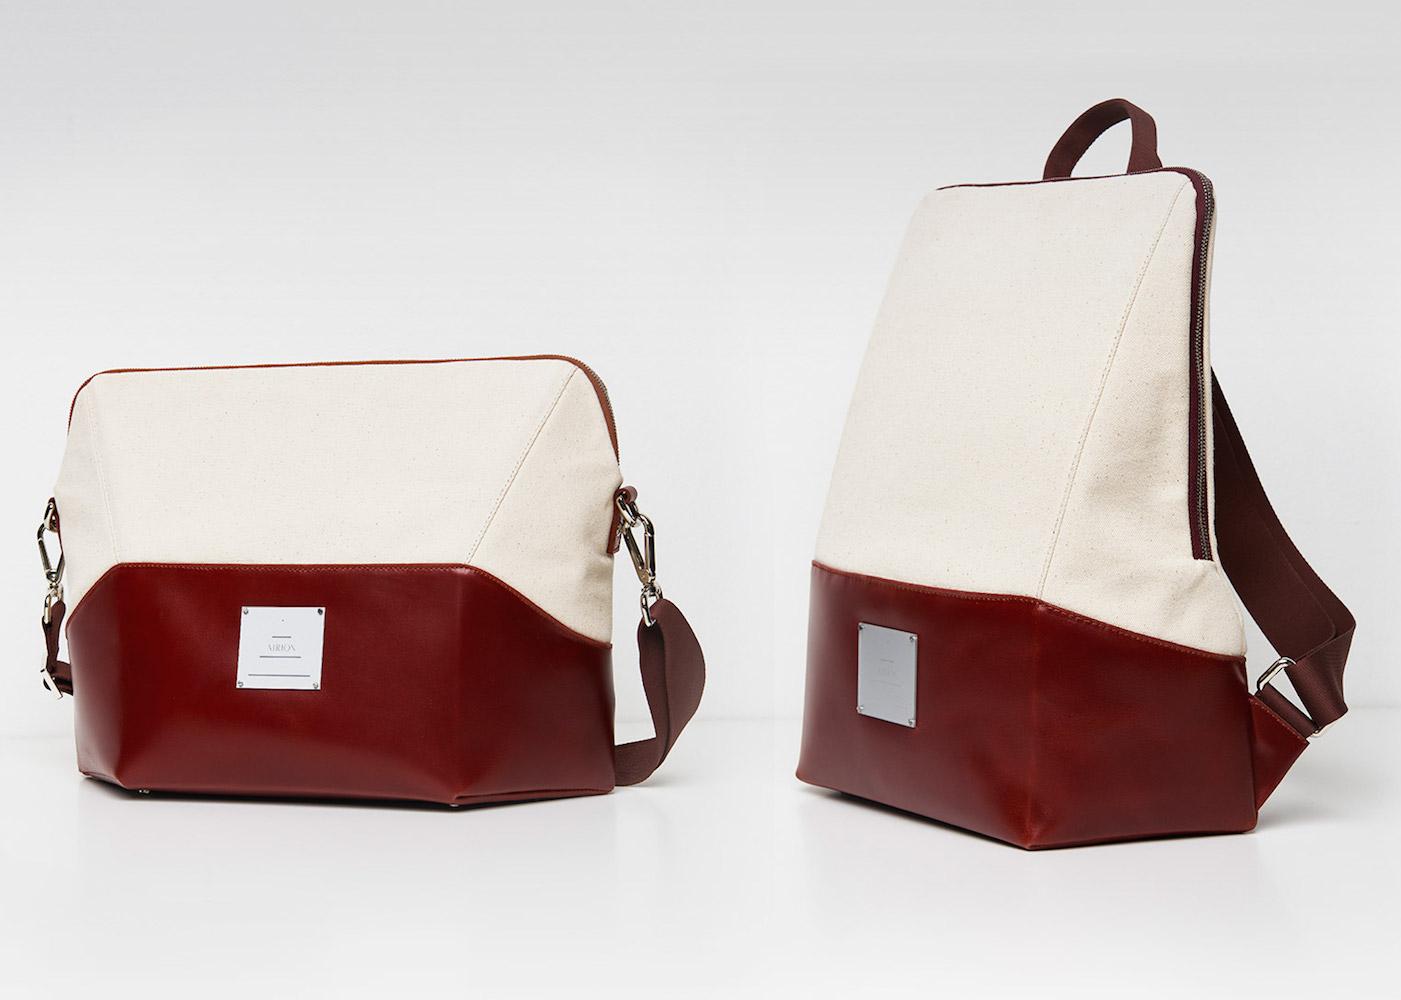 Airion Wireless Smartbag